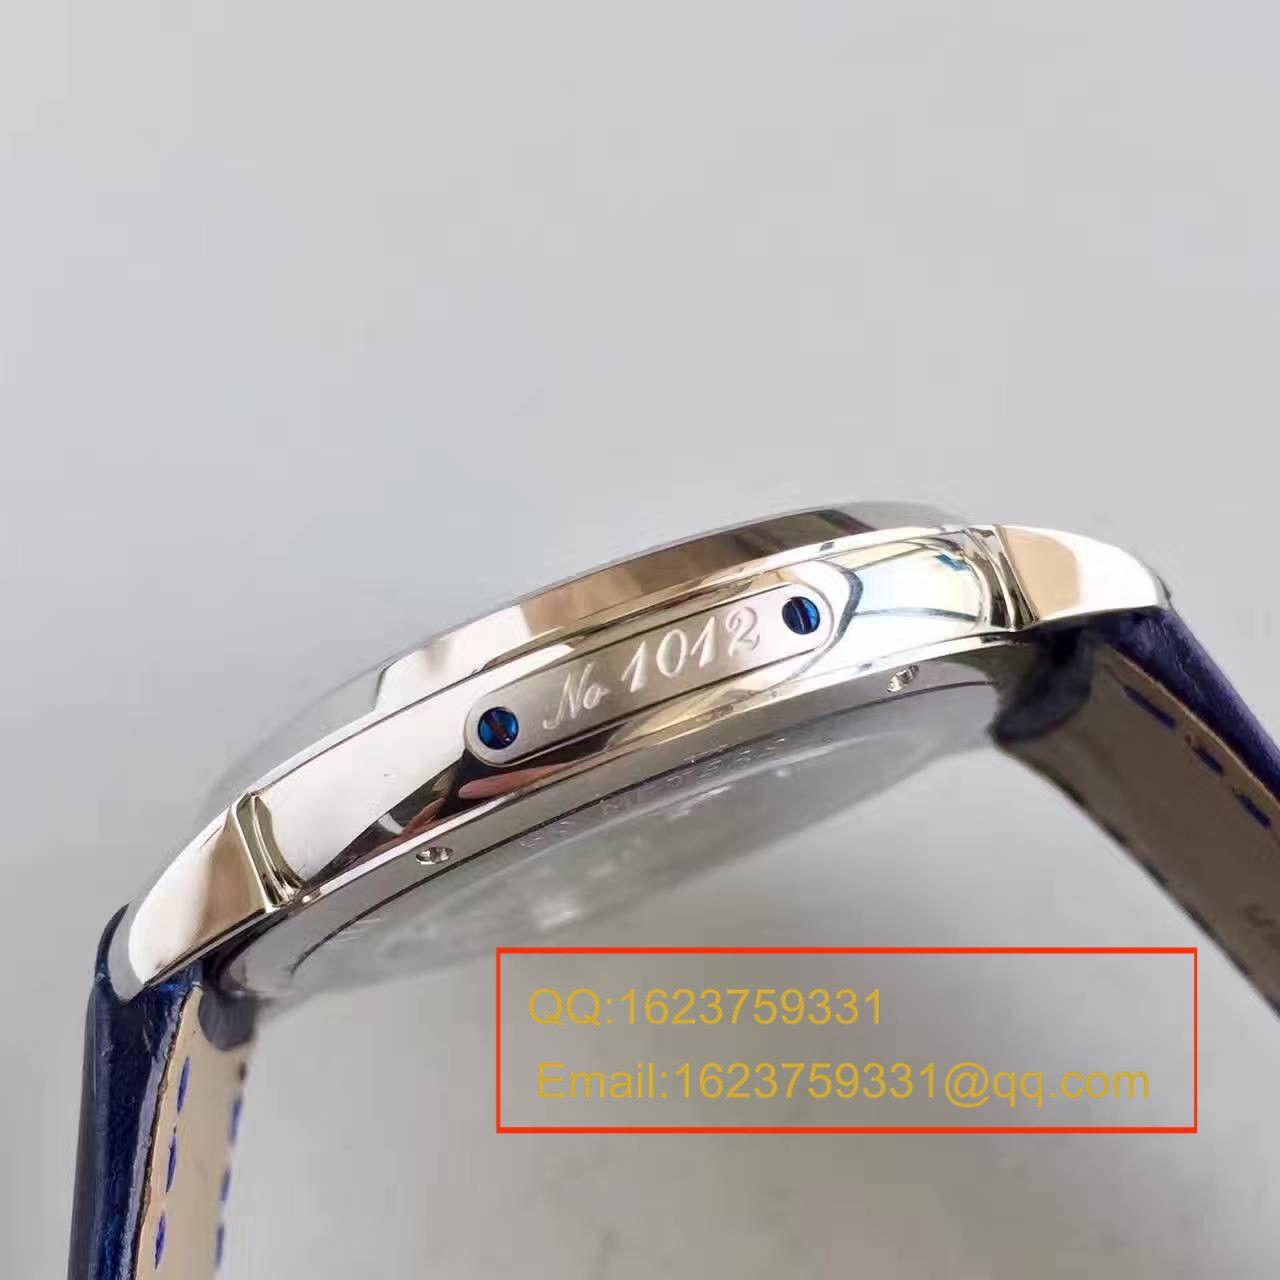 【FK厂1:1复刻手表】雅典鎏金系列8153-111-7/E3腕表 / YD002